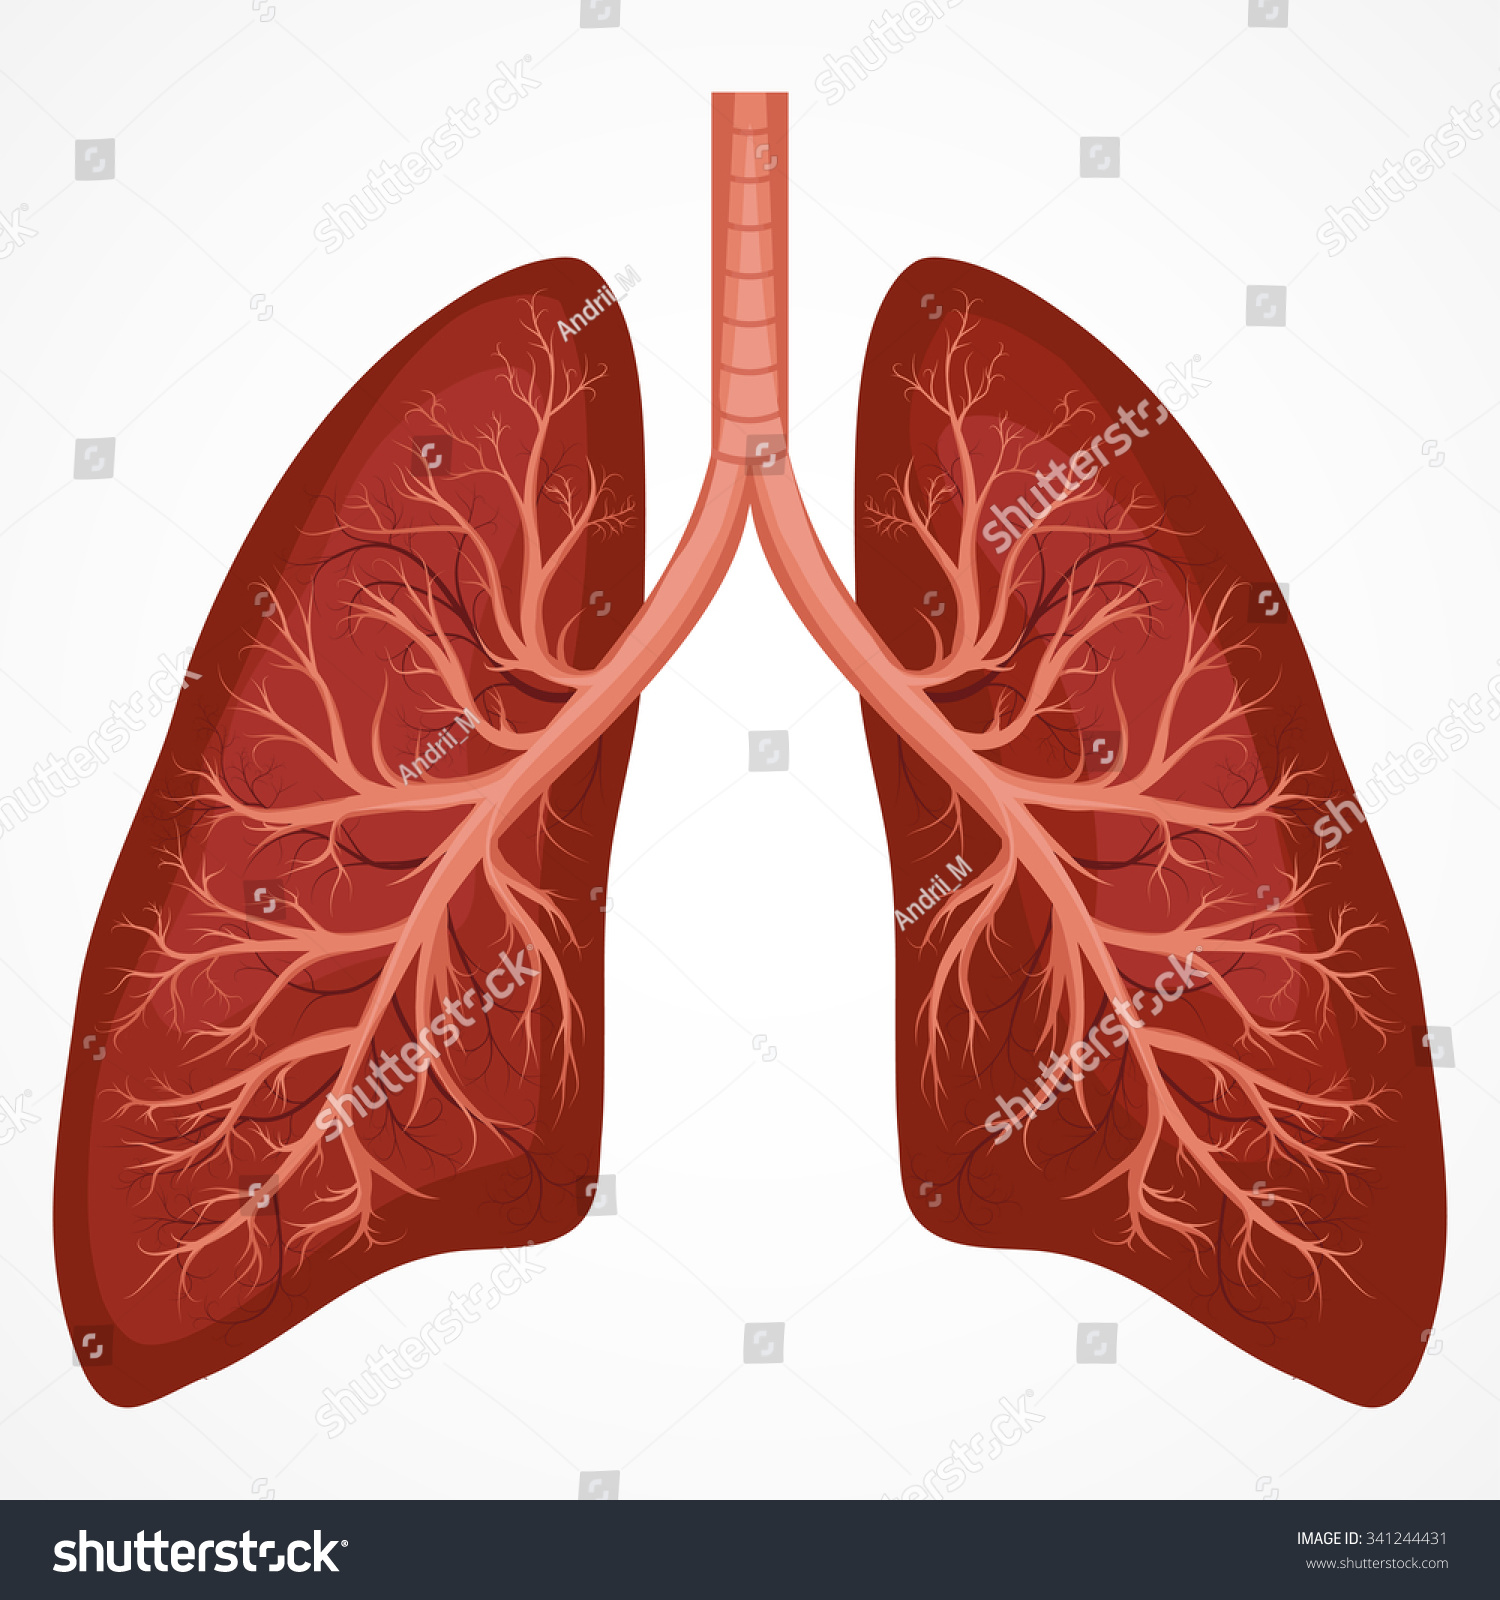 human lung anatomy diagram illness respiratory stock vector, Cephalic Vein